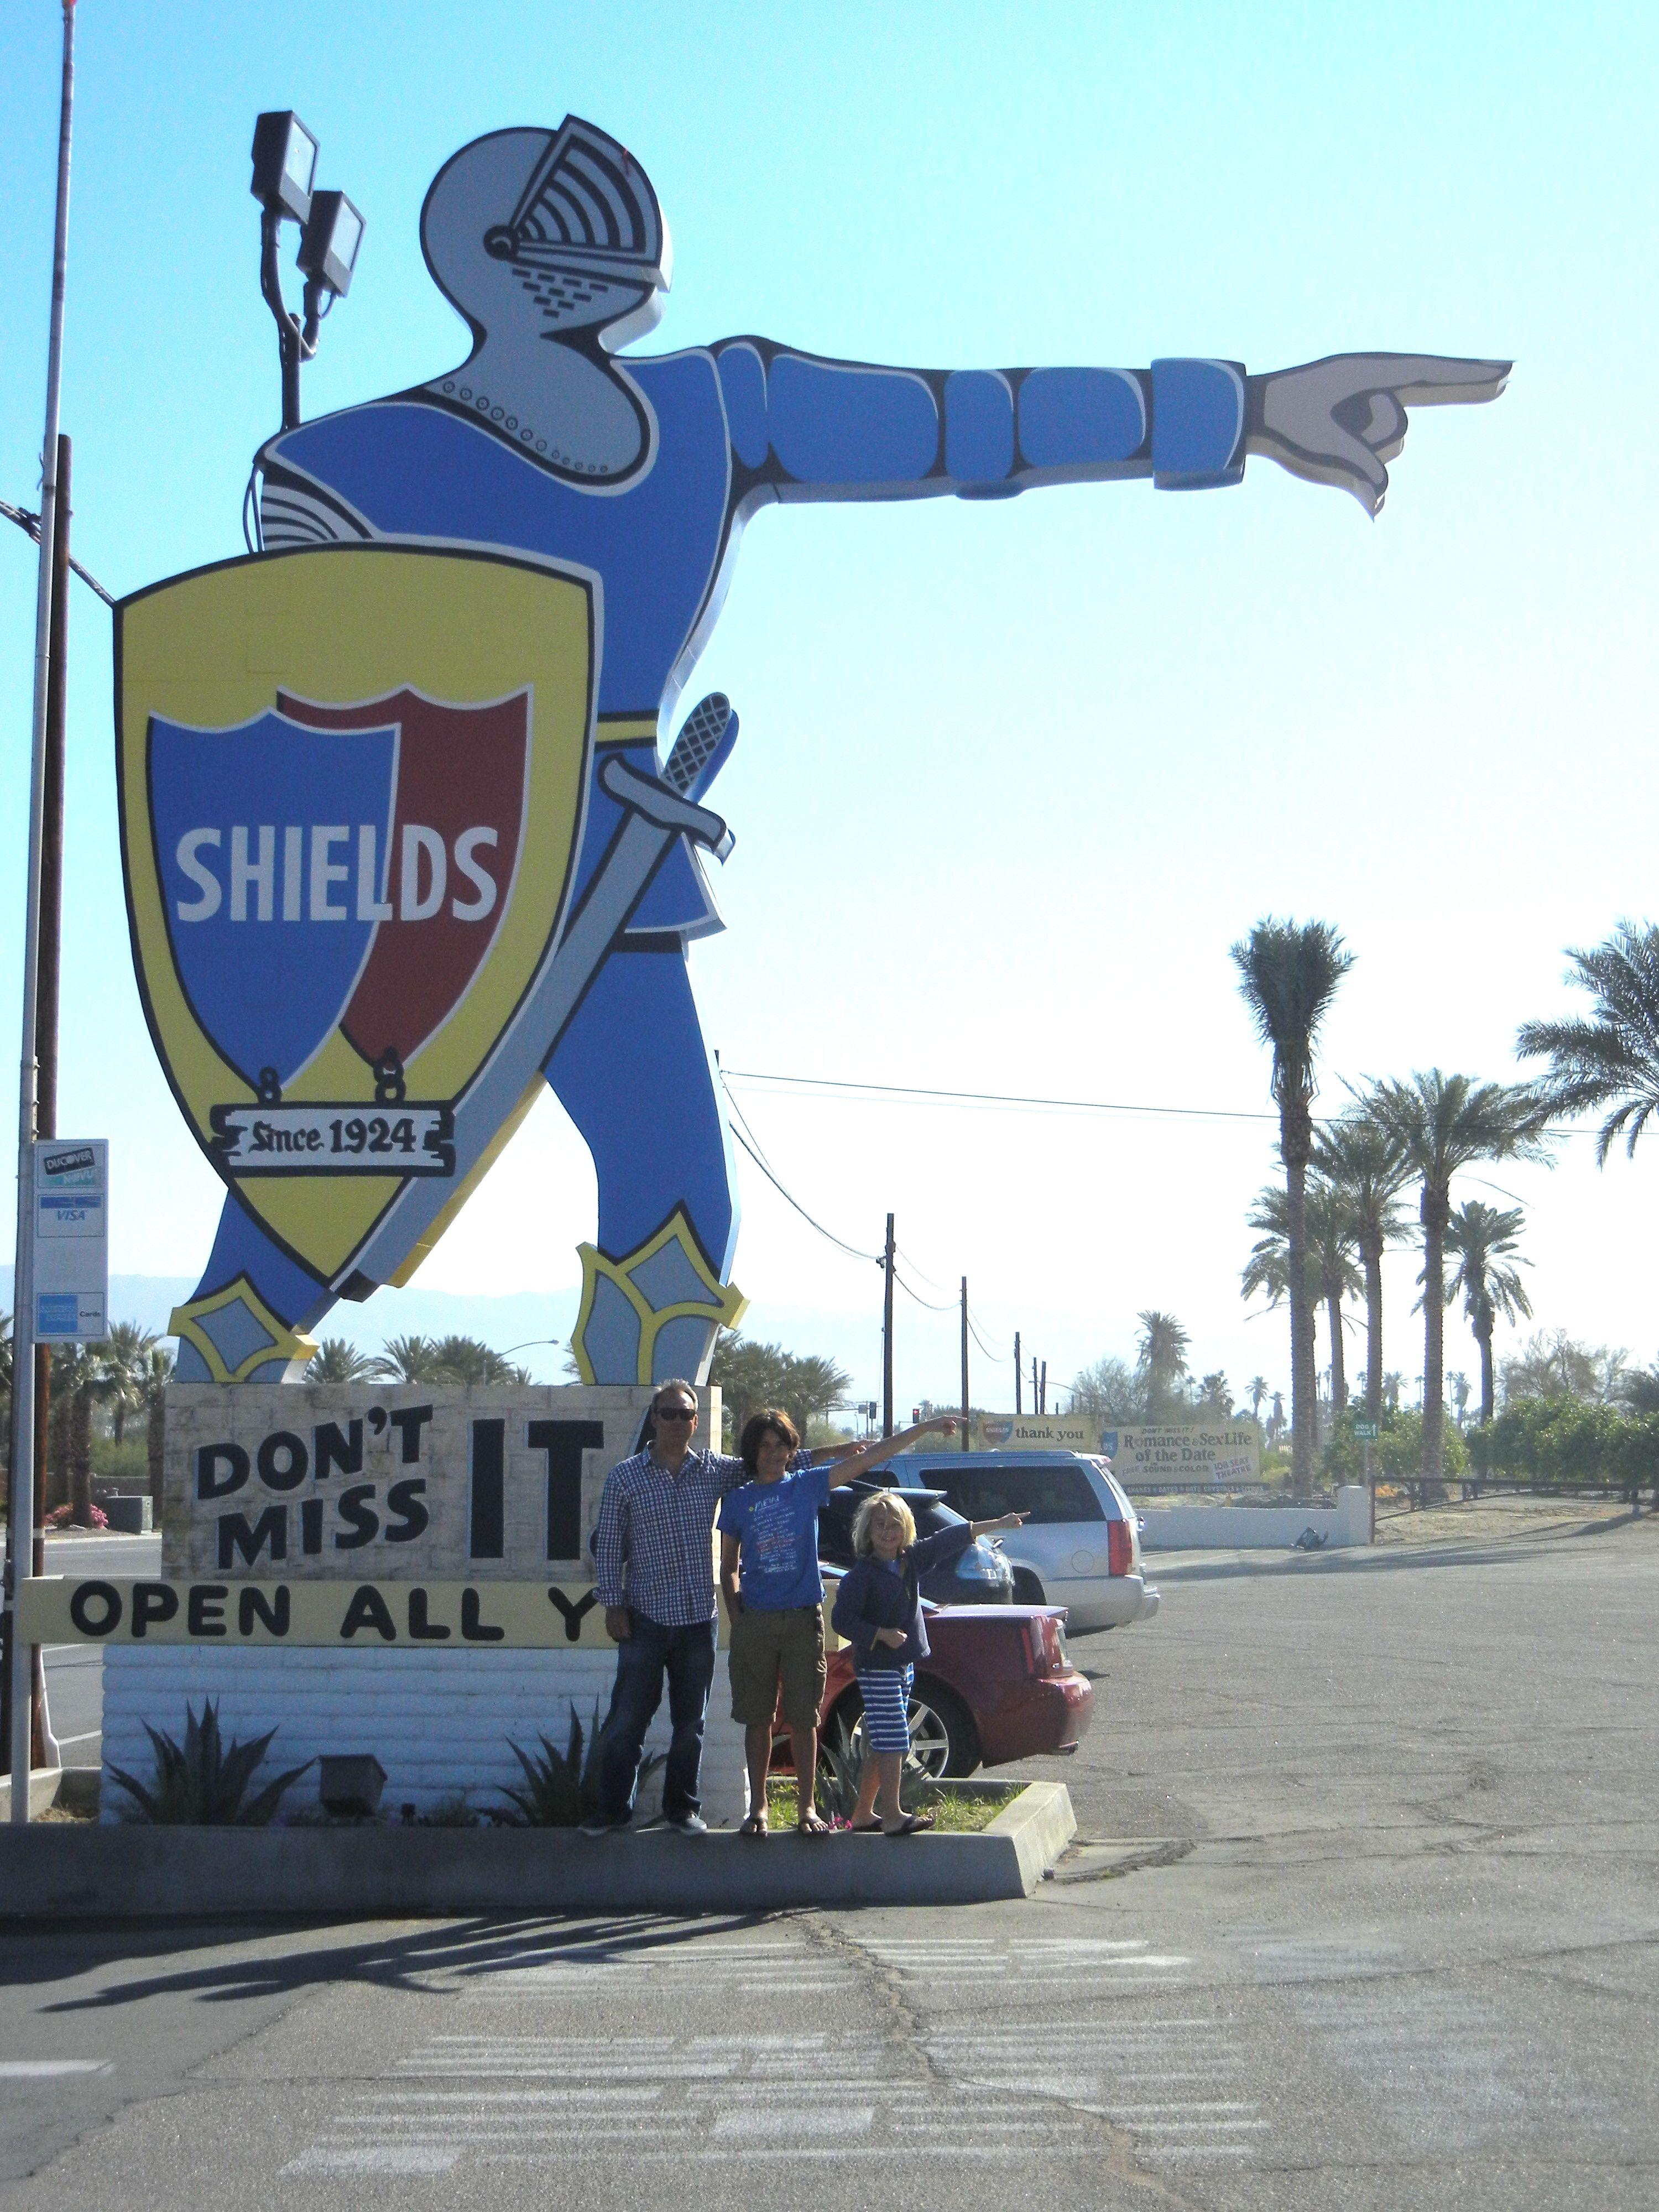 a trip to shields date garden - Shields Date Garden